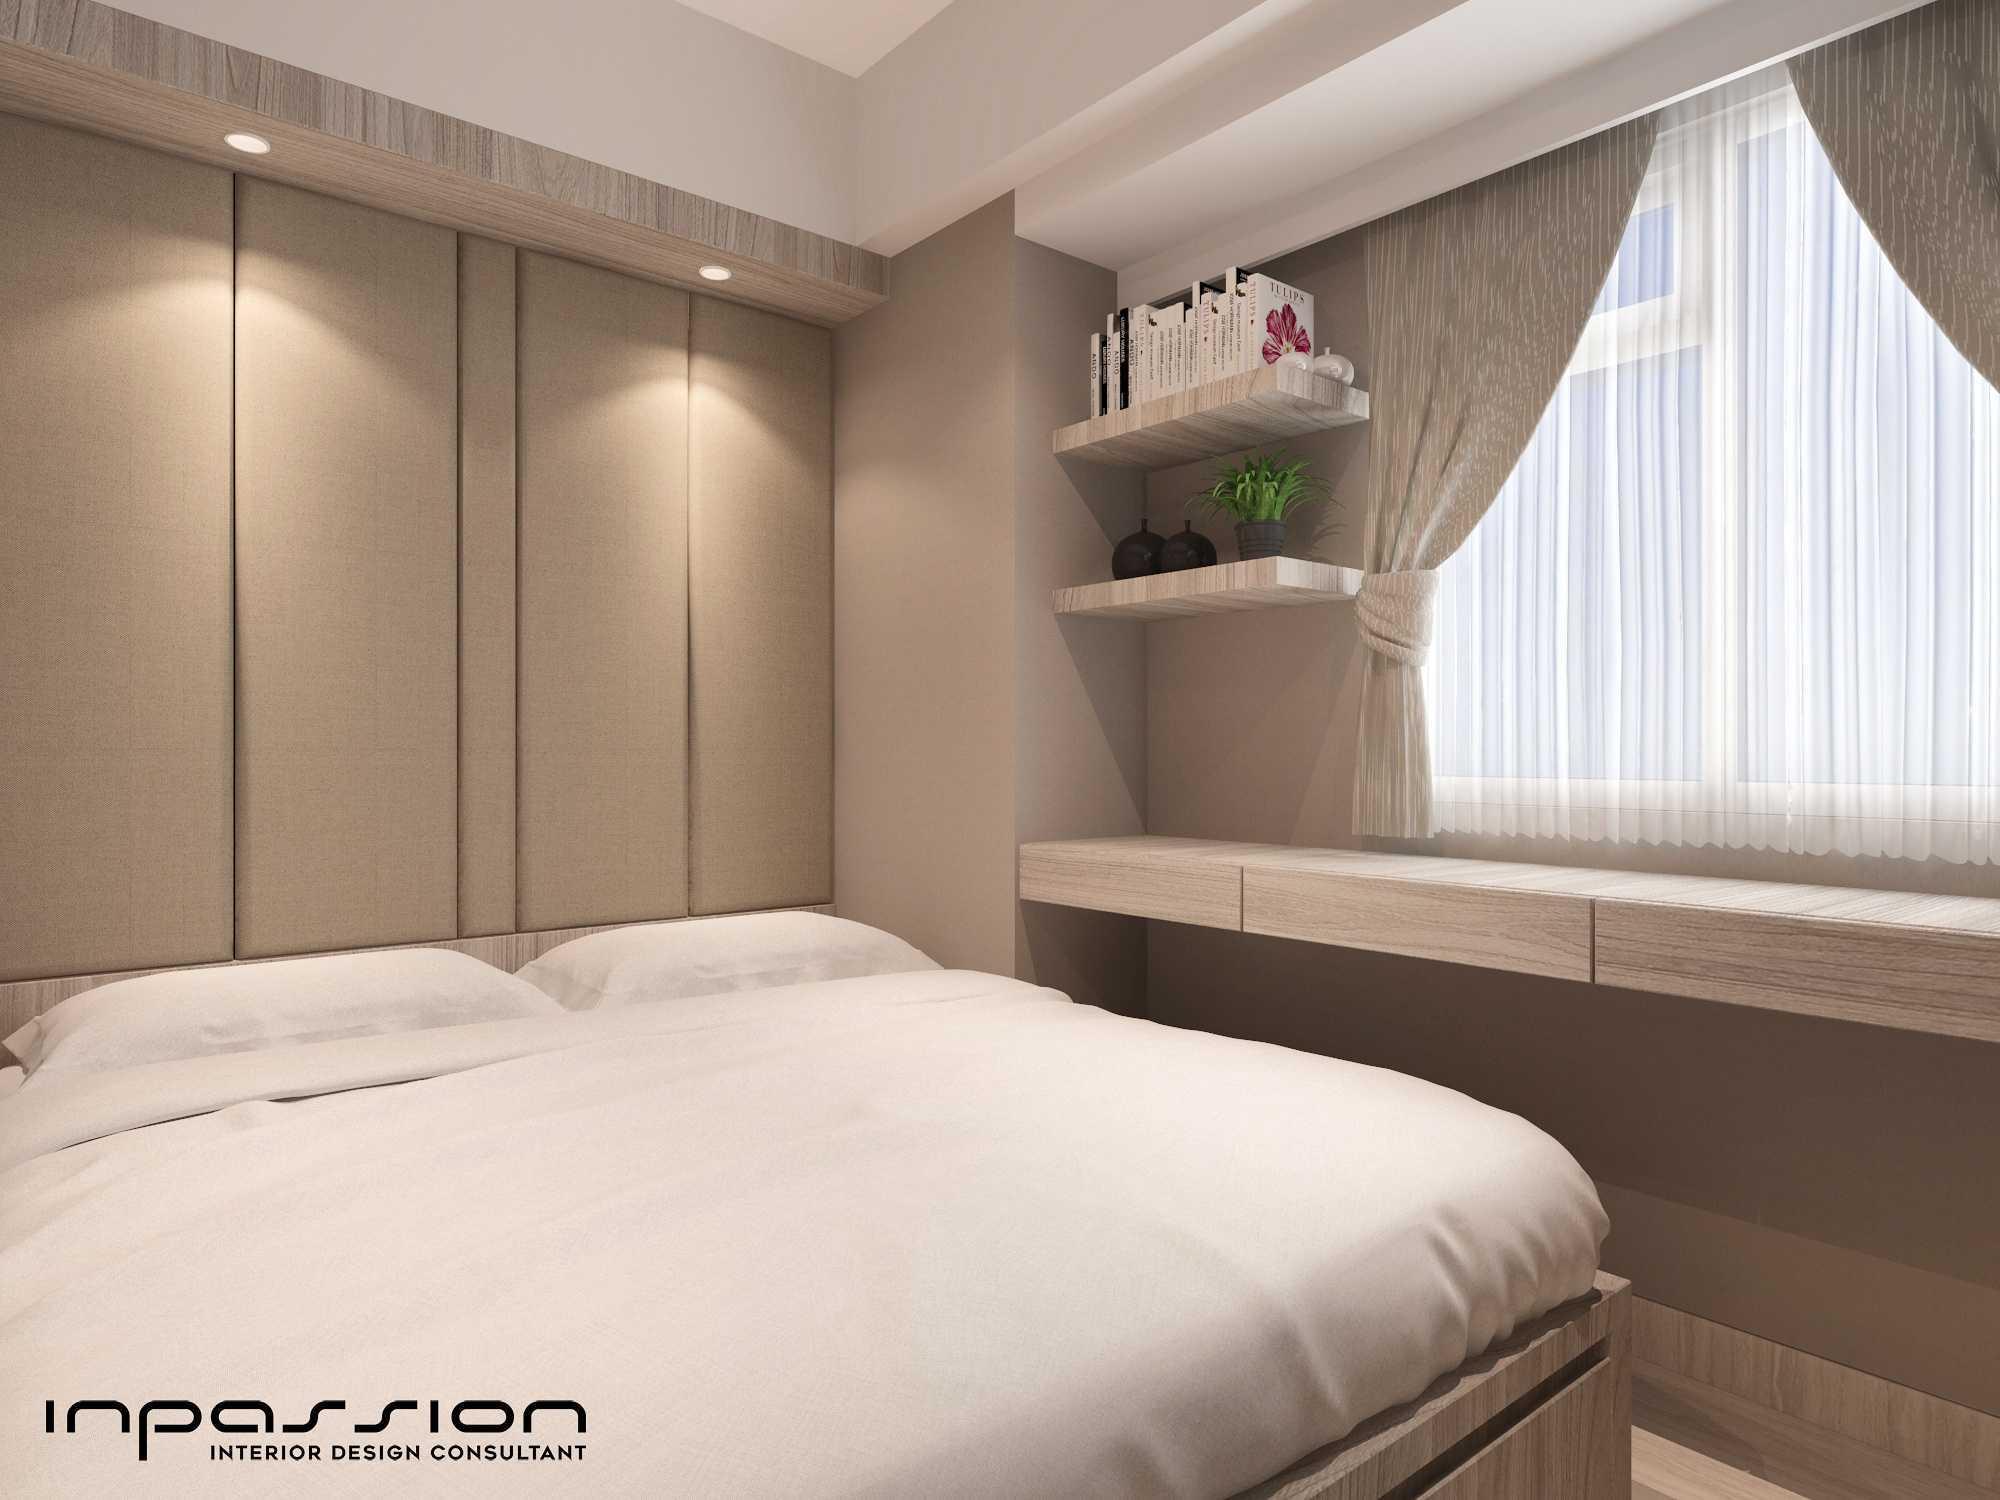 Inpassion Interior Design Educity Apartemen 3 Bedroom Surabaya City, East Java, Indonesia Surabaya City, East Java, Indonesia Img20170509154539793 Kontemporer  31590